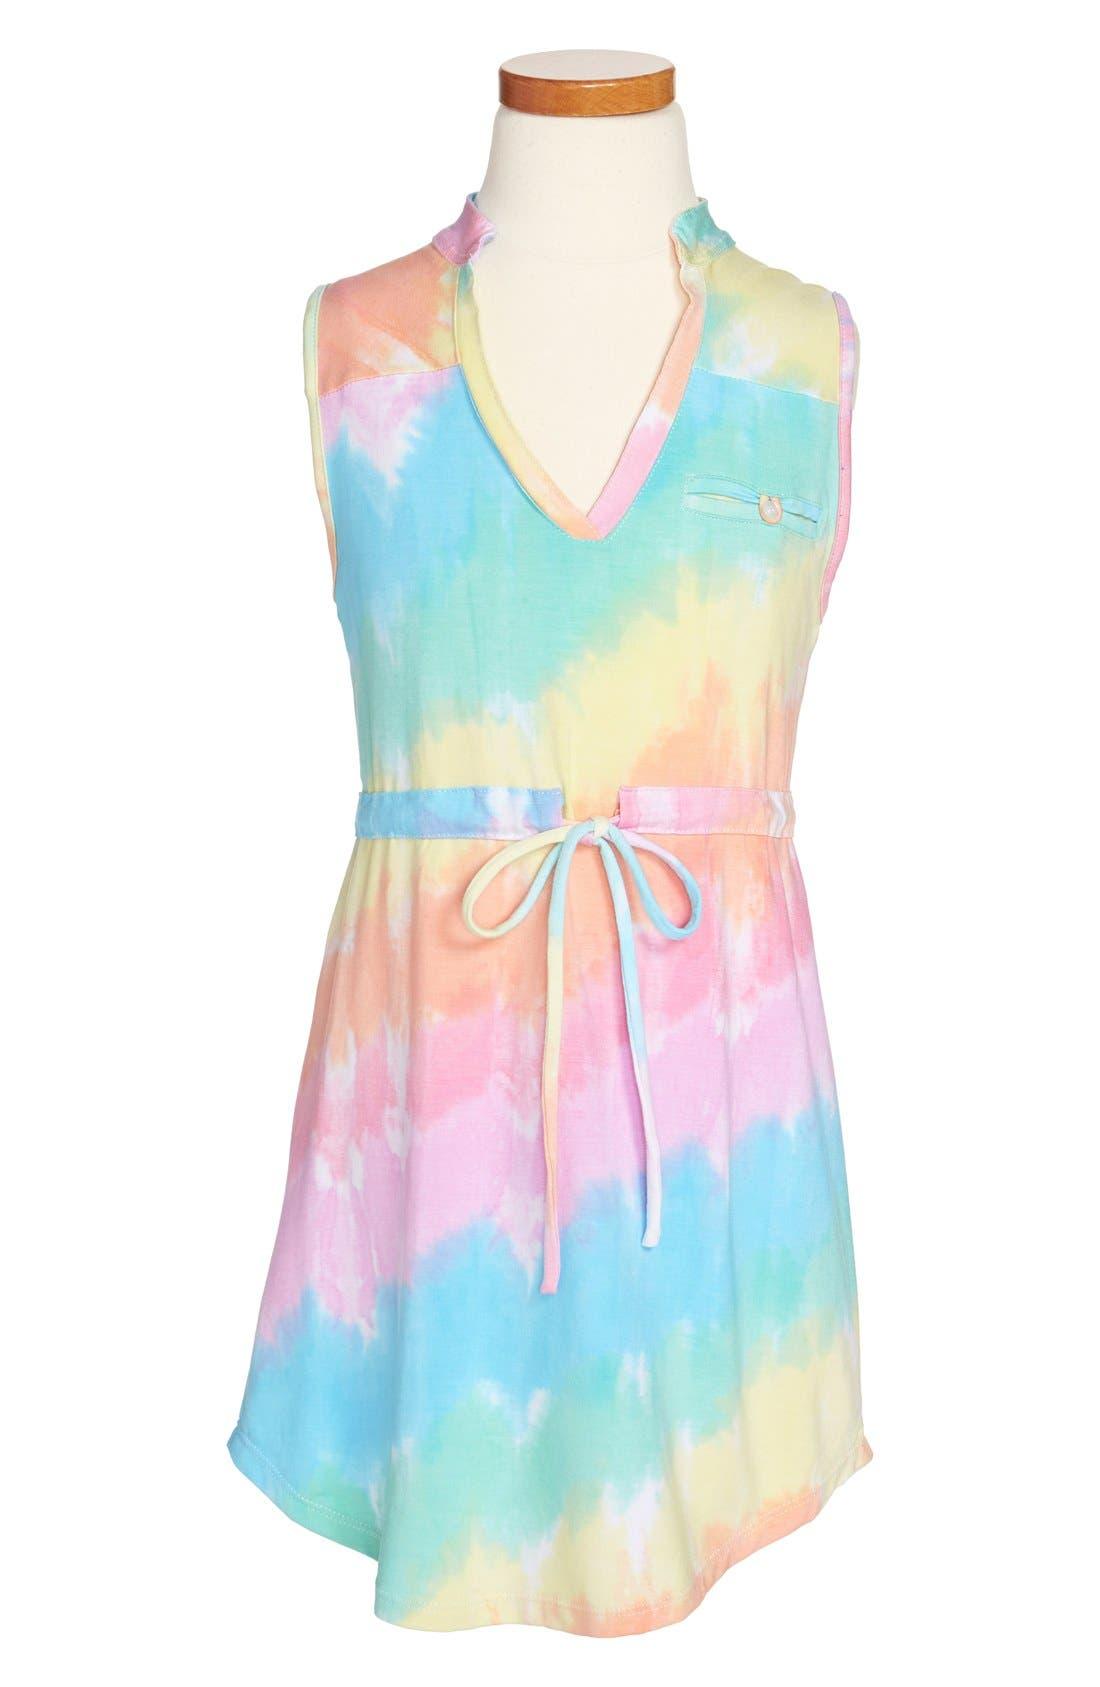 Main Image - Flowers by Zoe Tie Dye Sleeveless Dress (Big Girls)